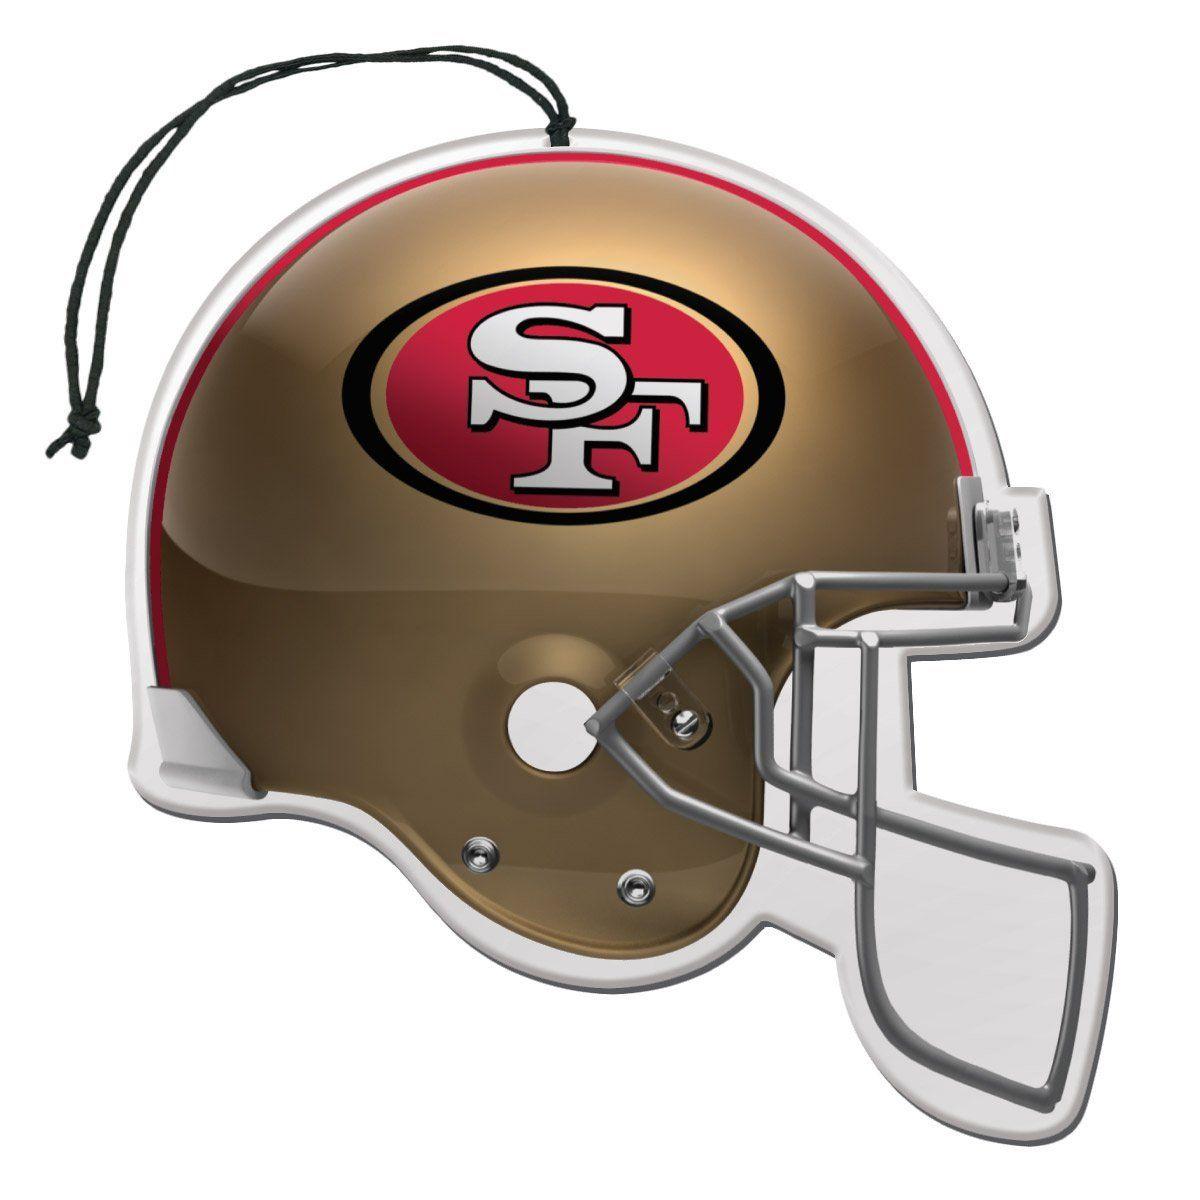 Amazon.com : NFL San Fransisco 49ers Air Fresheners (3-Pack) : Automotive Air Fresheners : $7.22  http://www.amazon.com/gp/product/B001C0UCV4/ref=as_li_qf_sp_asin_il_tl?ie=UTF8&camp=1789&creative=9325&creativeASIN=B001C0UCV4&linkCode=as2&tag=softantibacte-20&linkId=NAQ76OY3EZEXUM4F